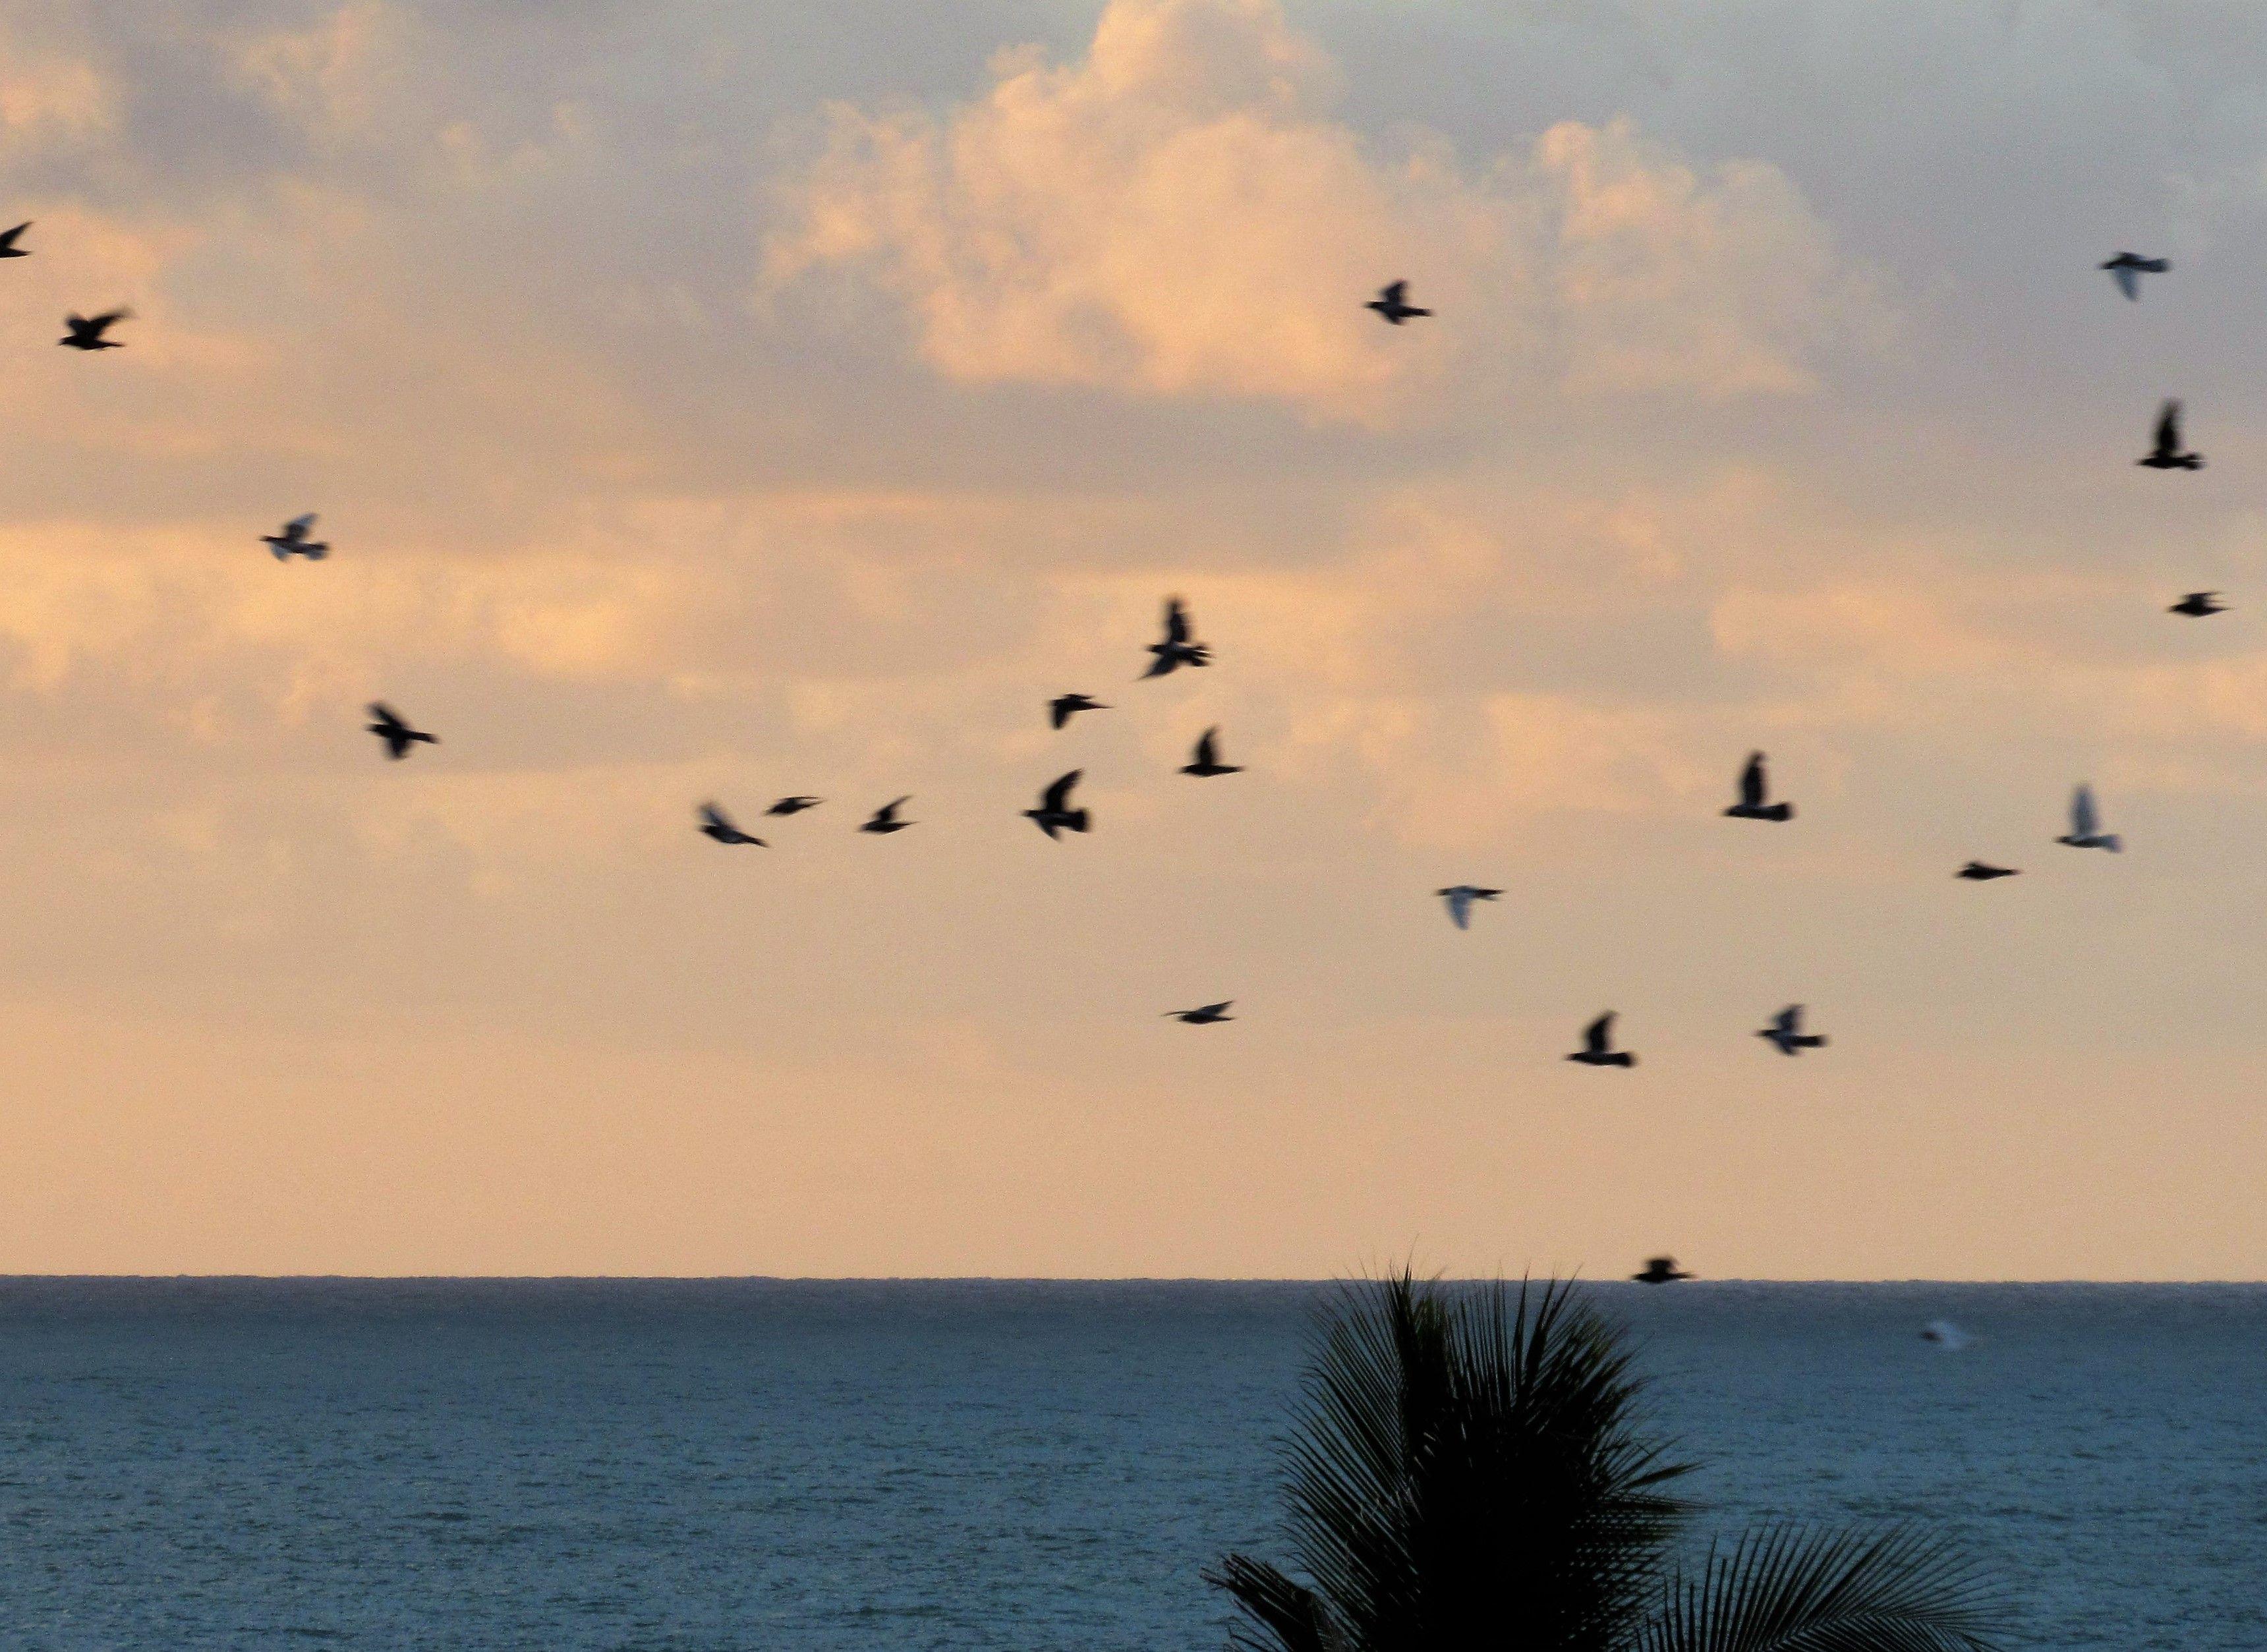 infinity of little birds